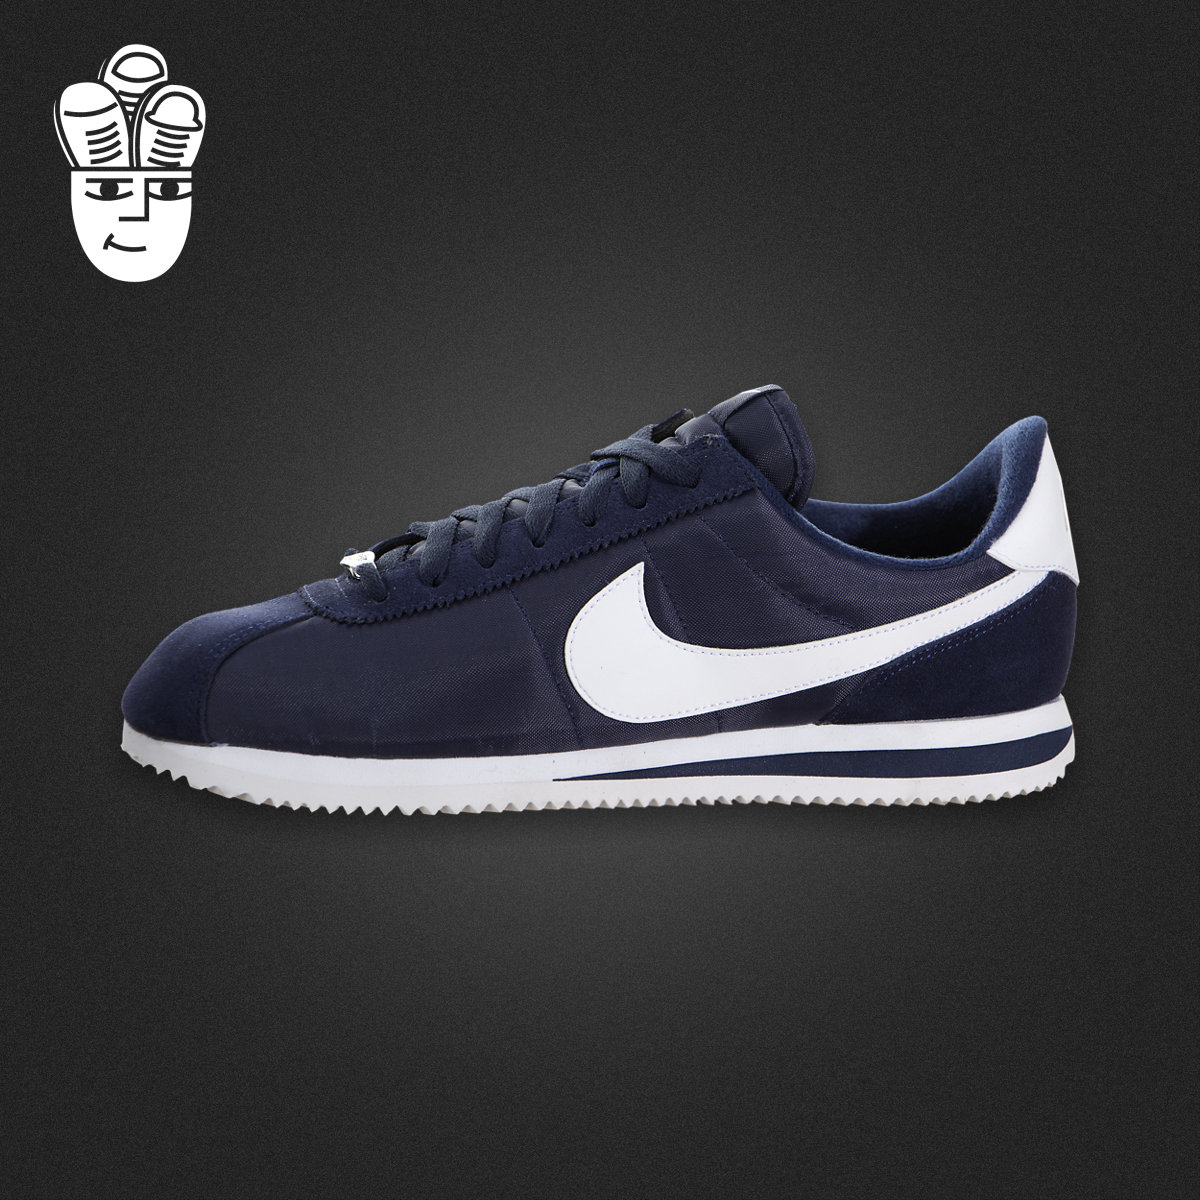 Nike Cortez Basic Nylon 耐克男子休閒板鞋 阿甘鞋經典款